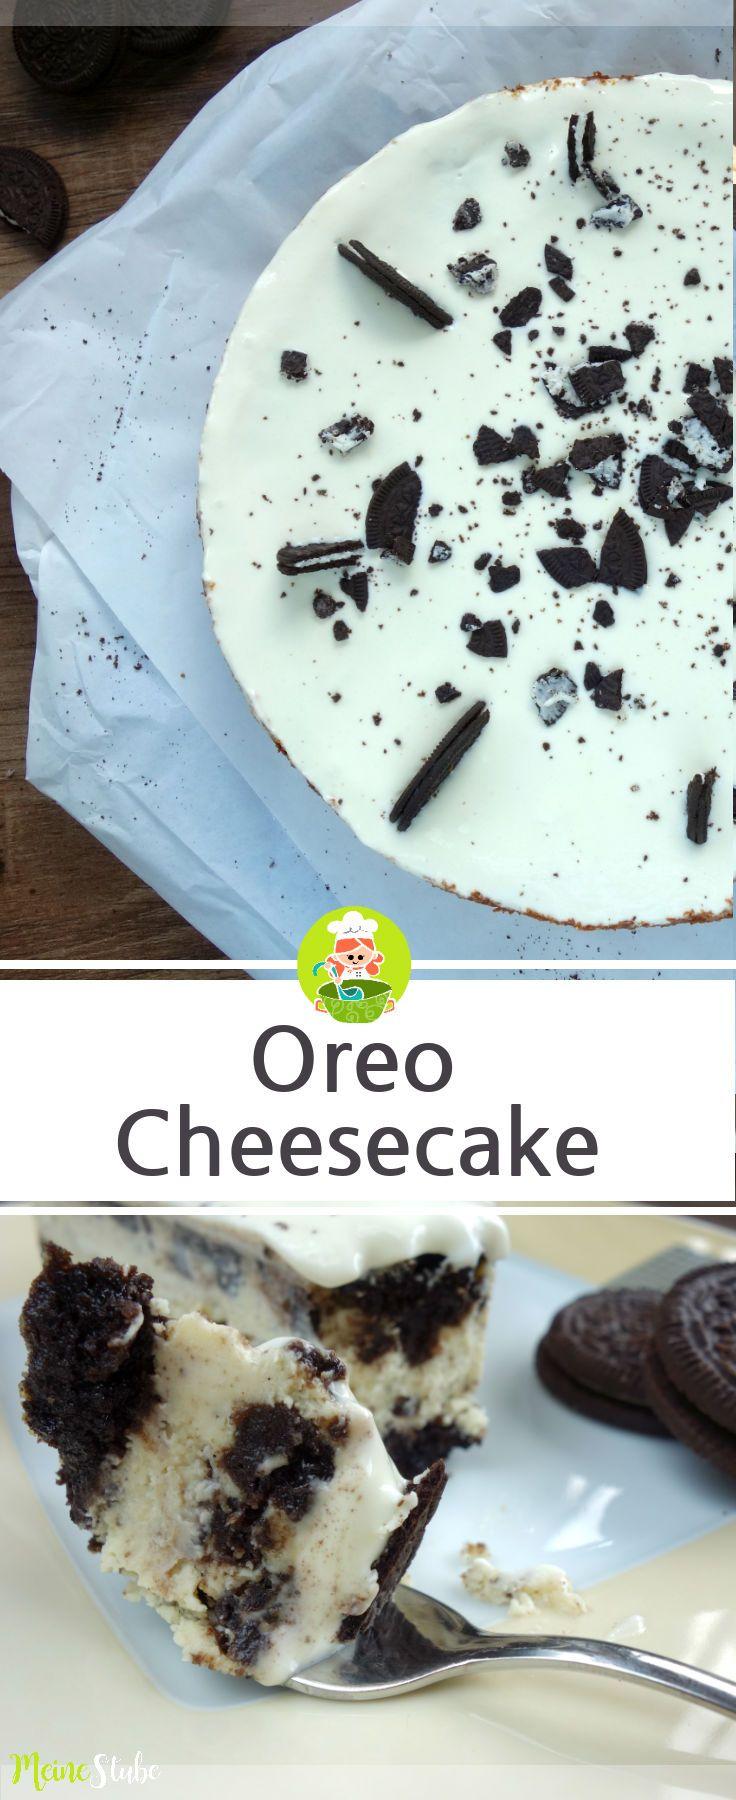 oreo cheesecake ein k sekuchen aus oreo keksen rezept kuchen desserts kuchen k sekuchen. Black Bedroom Furniture Sets. Home Design Ideas